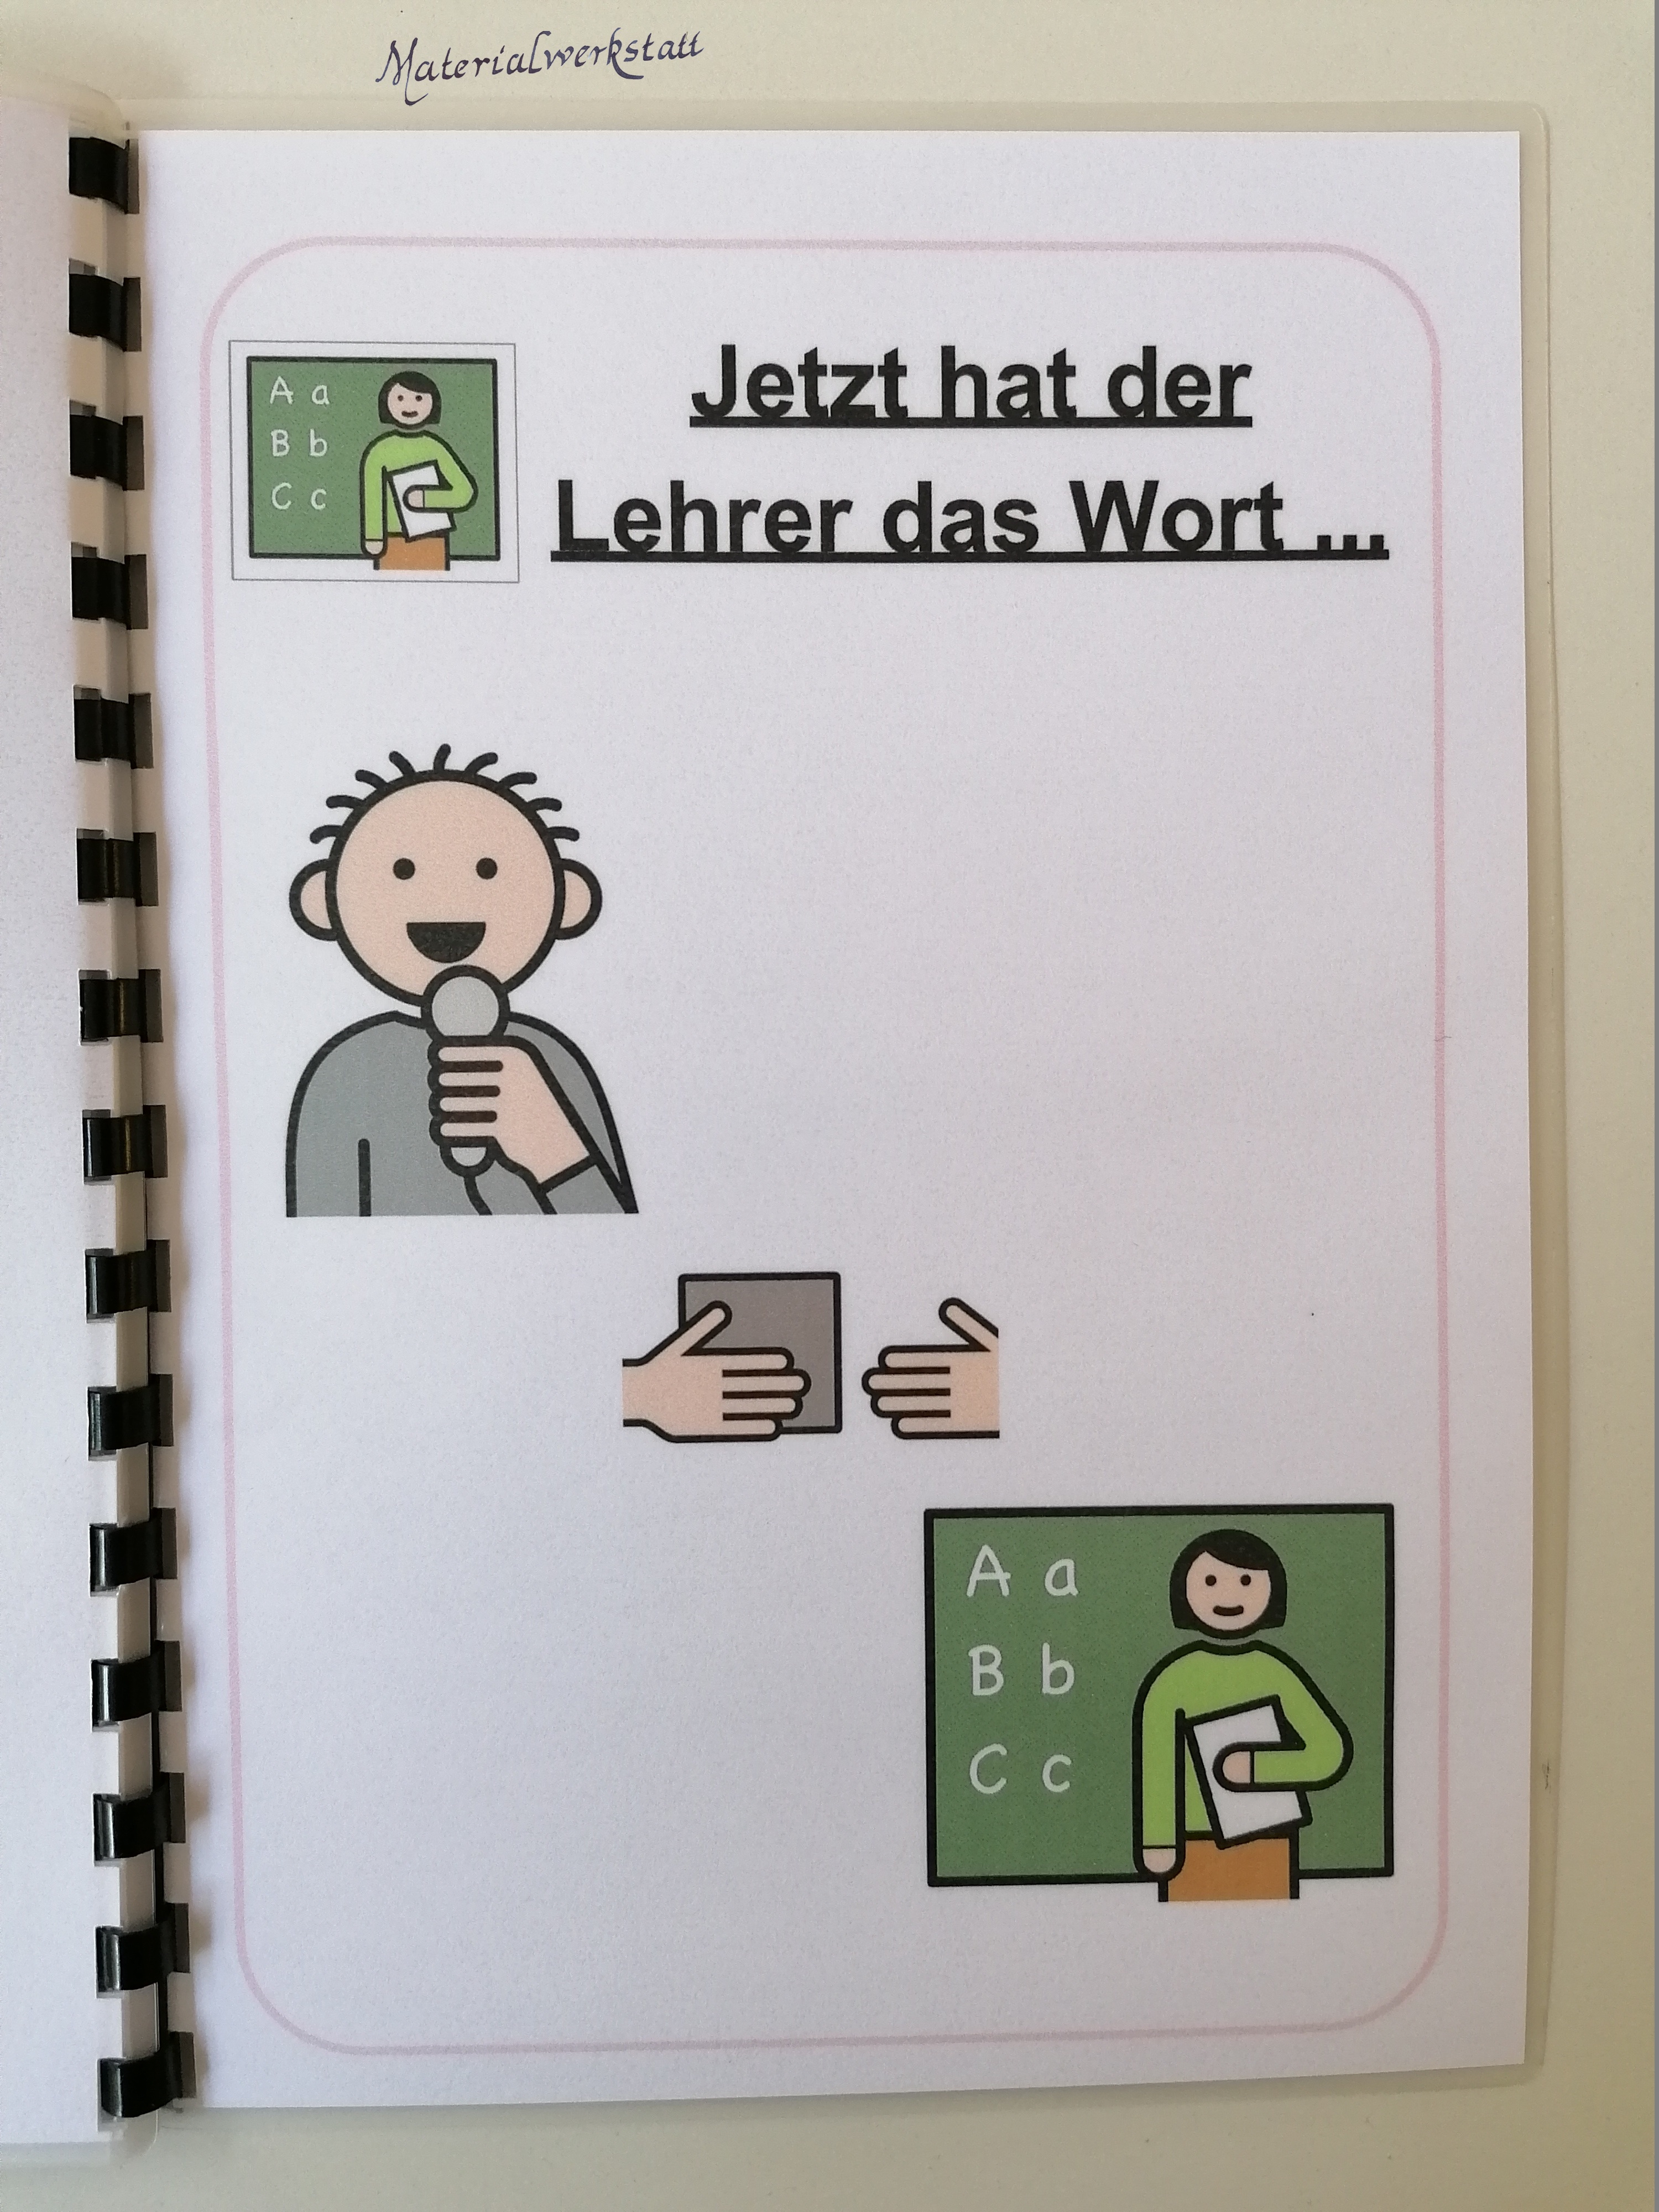 Moderationsbuch Morgenkreis Materialwerkstatt